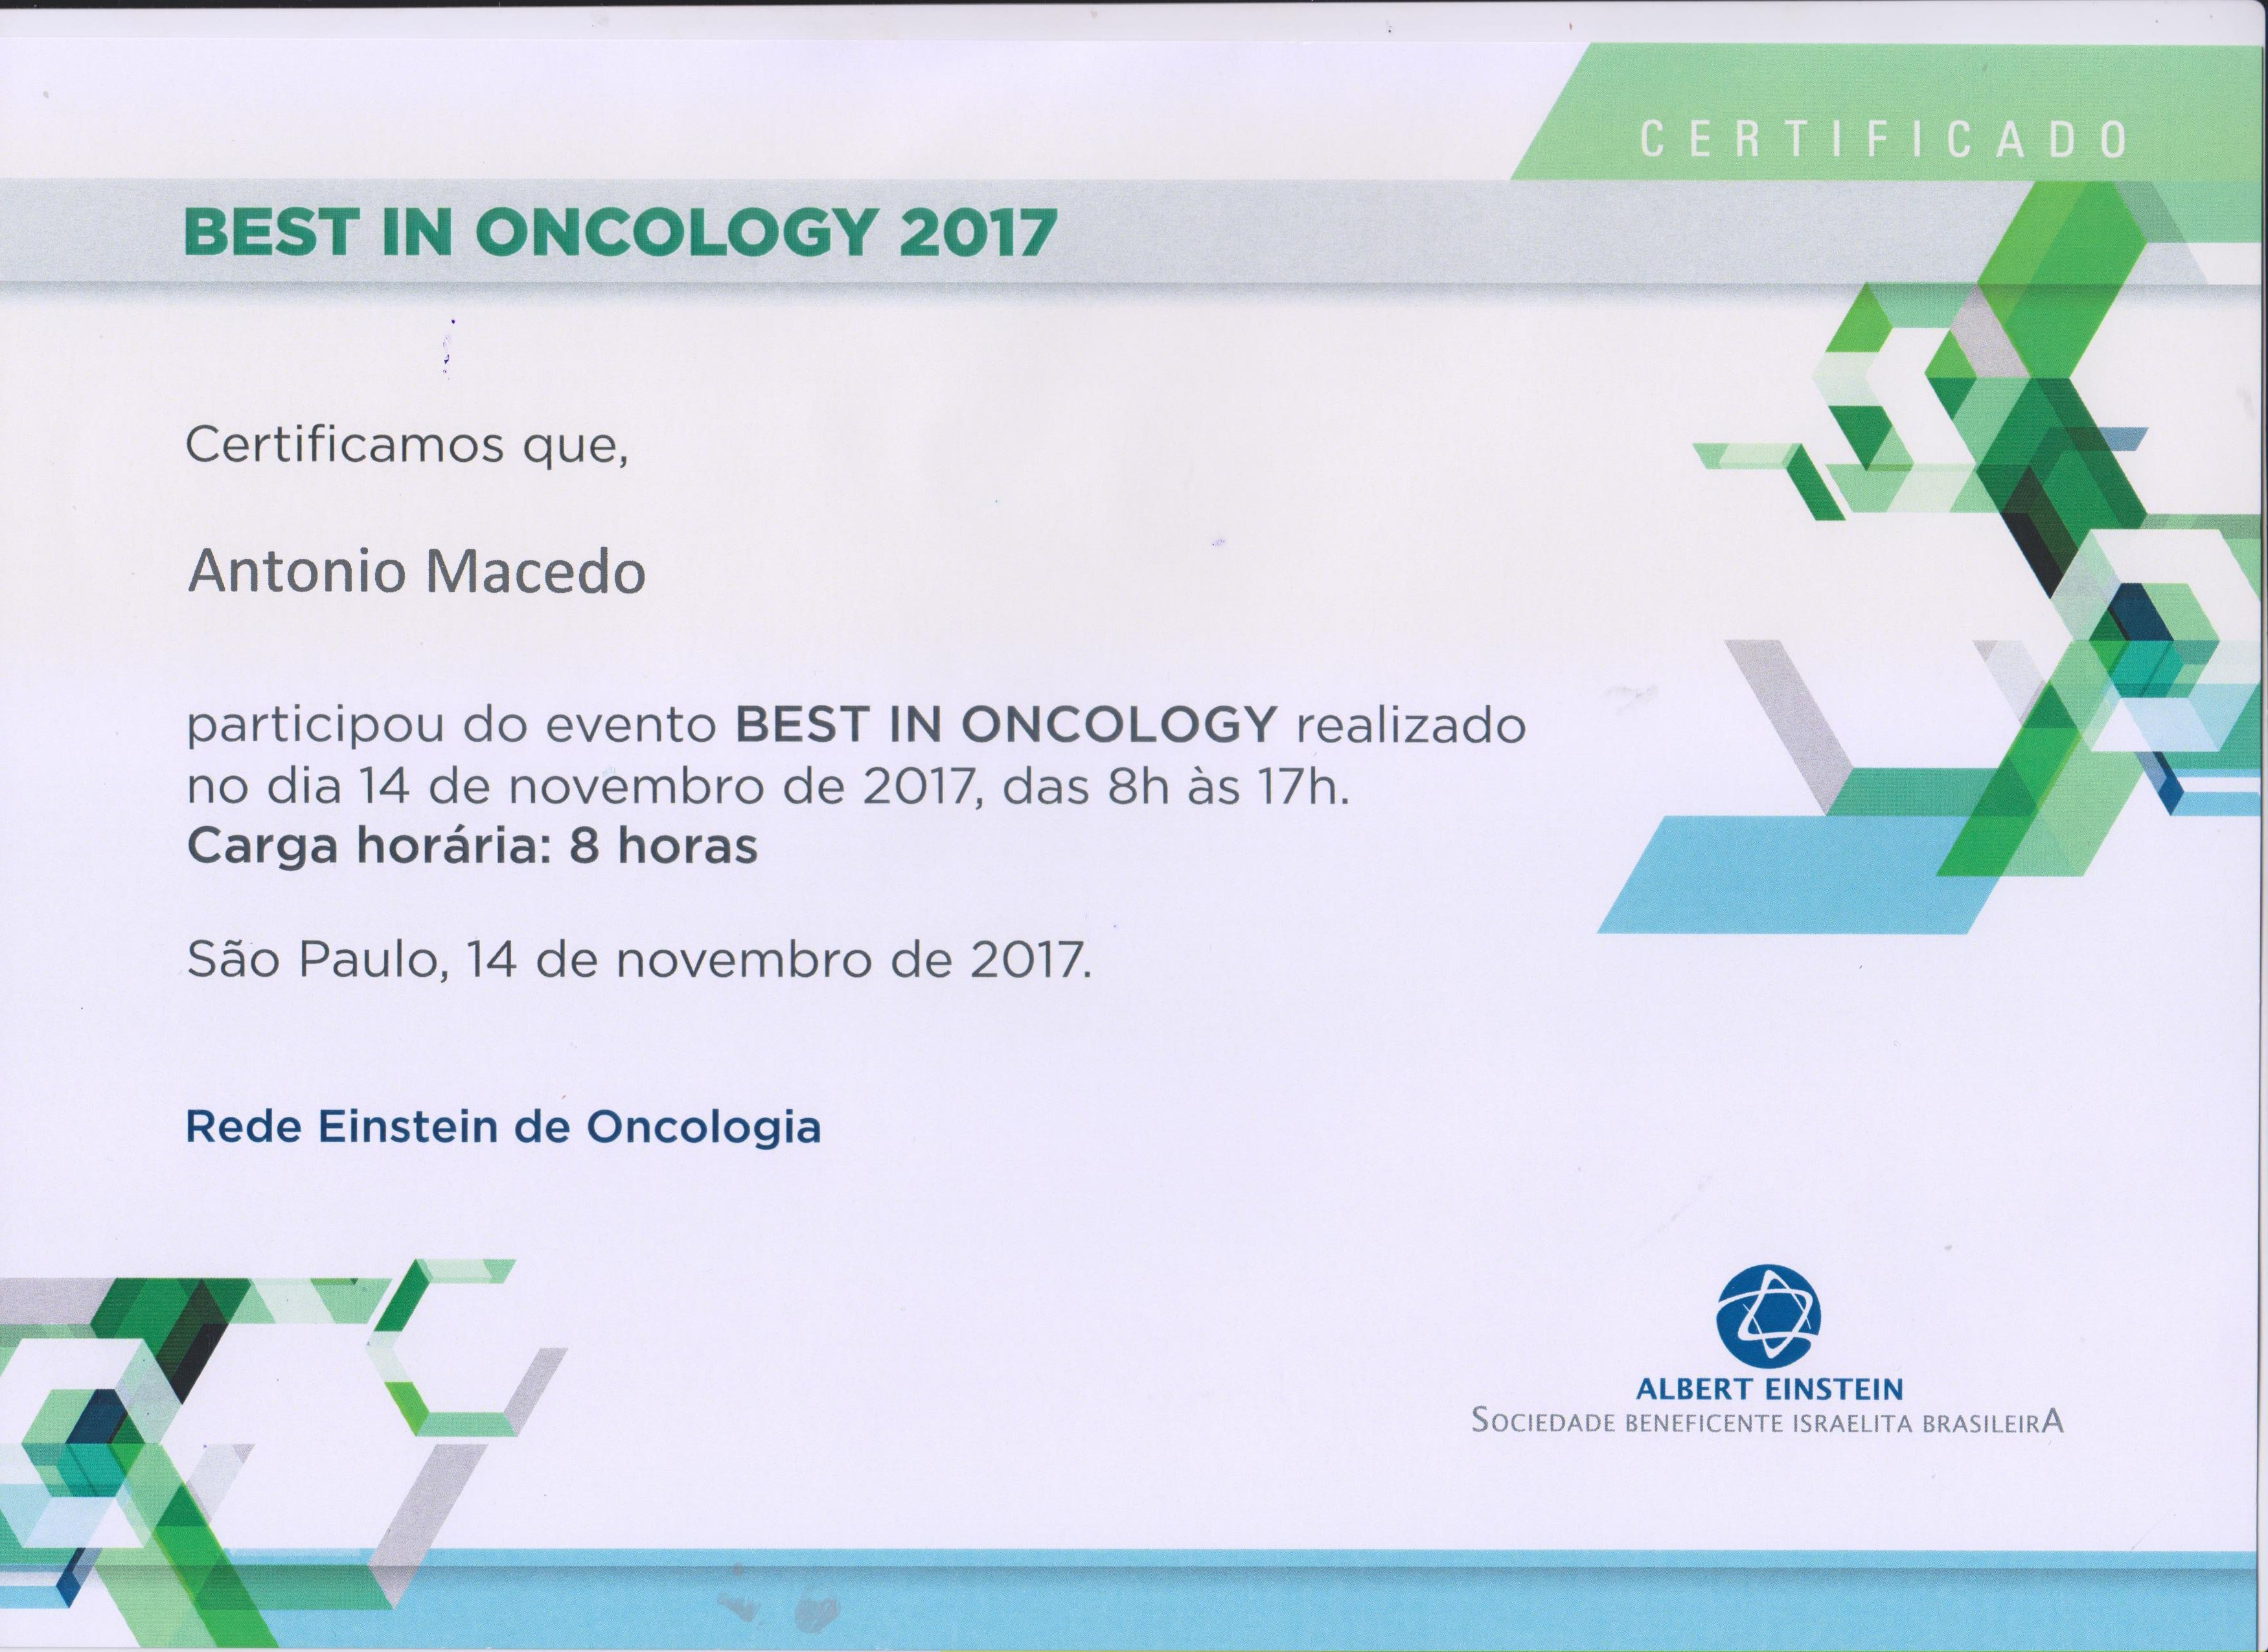 diploma Dr. macedo